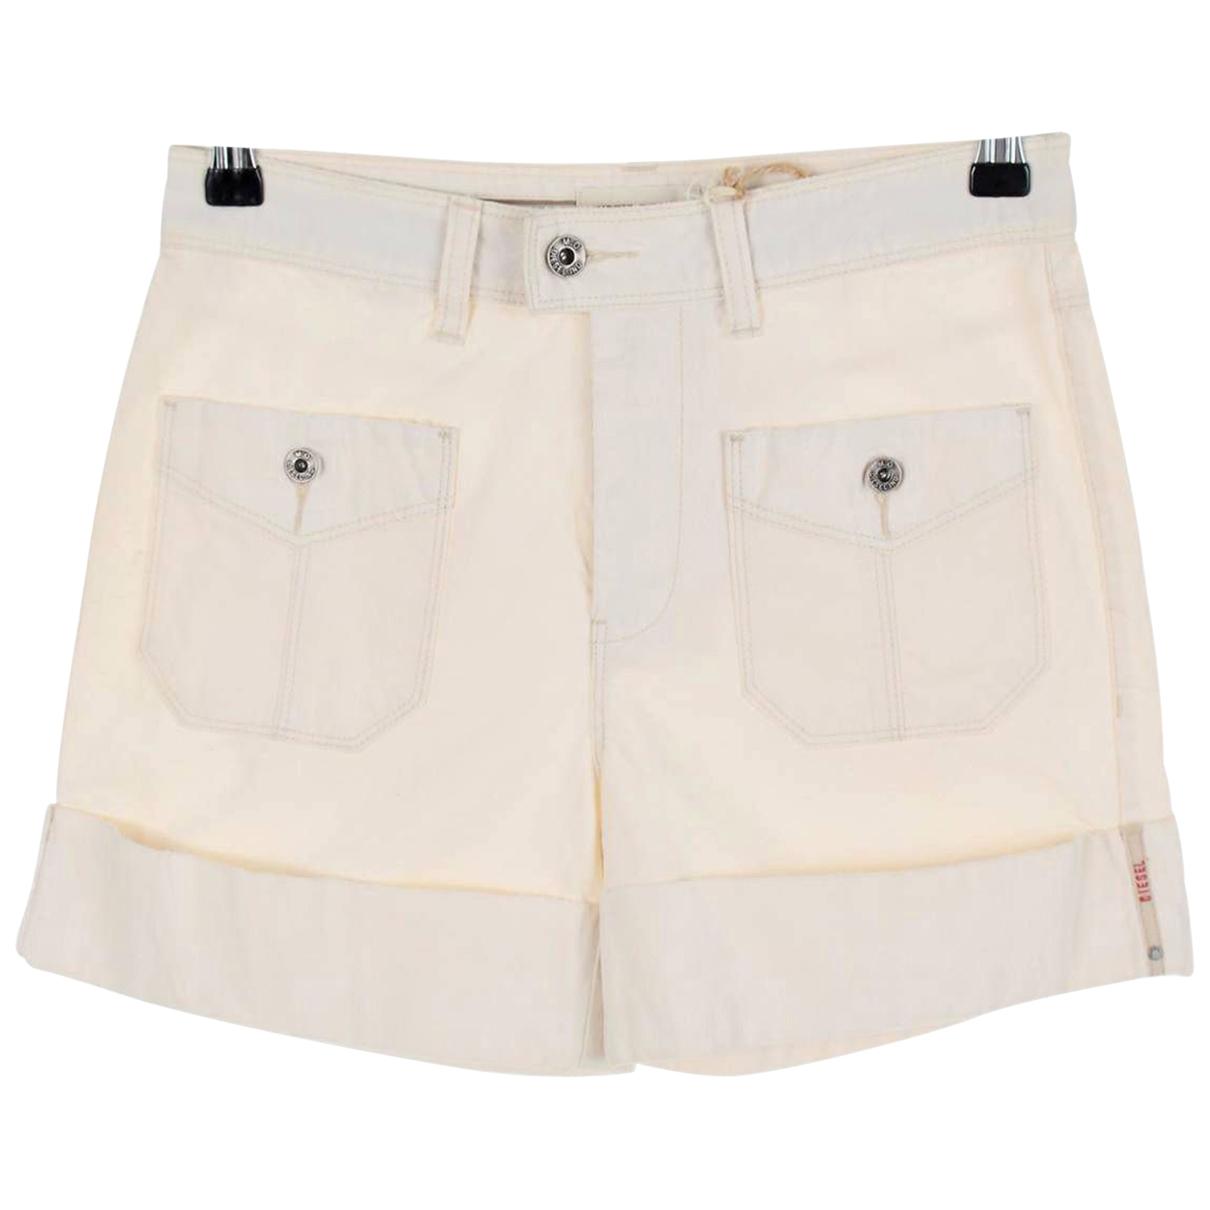 Diesel \N Ecru Cotton Shorts for Women XS International